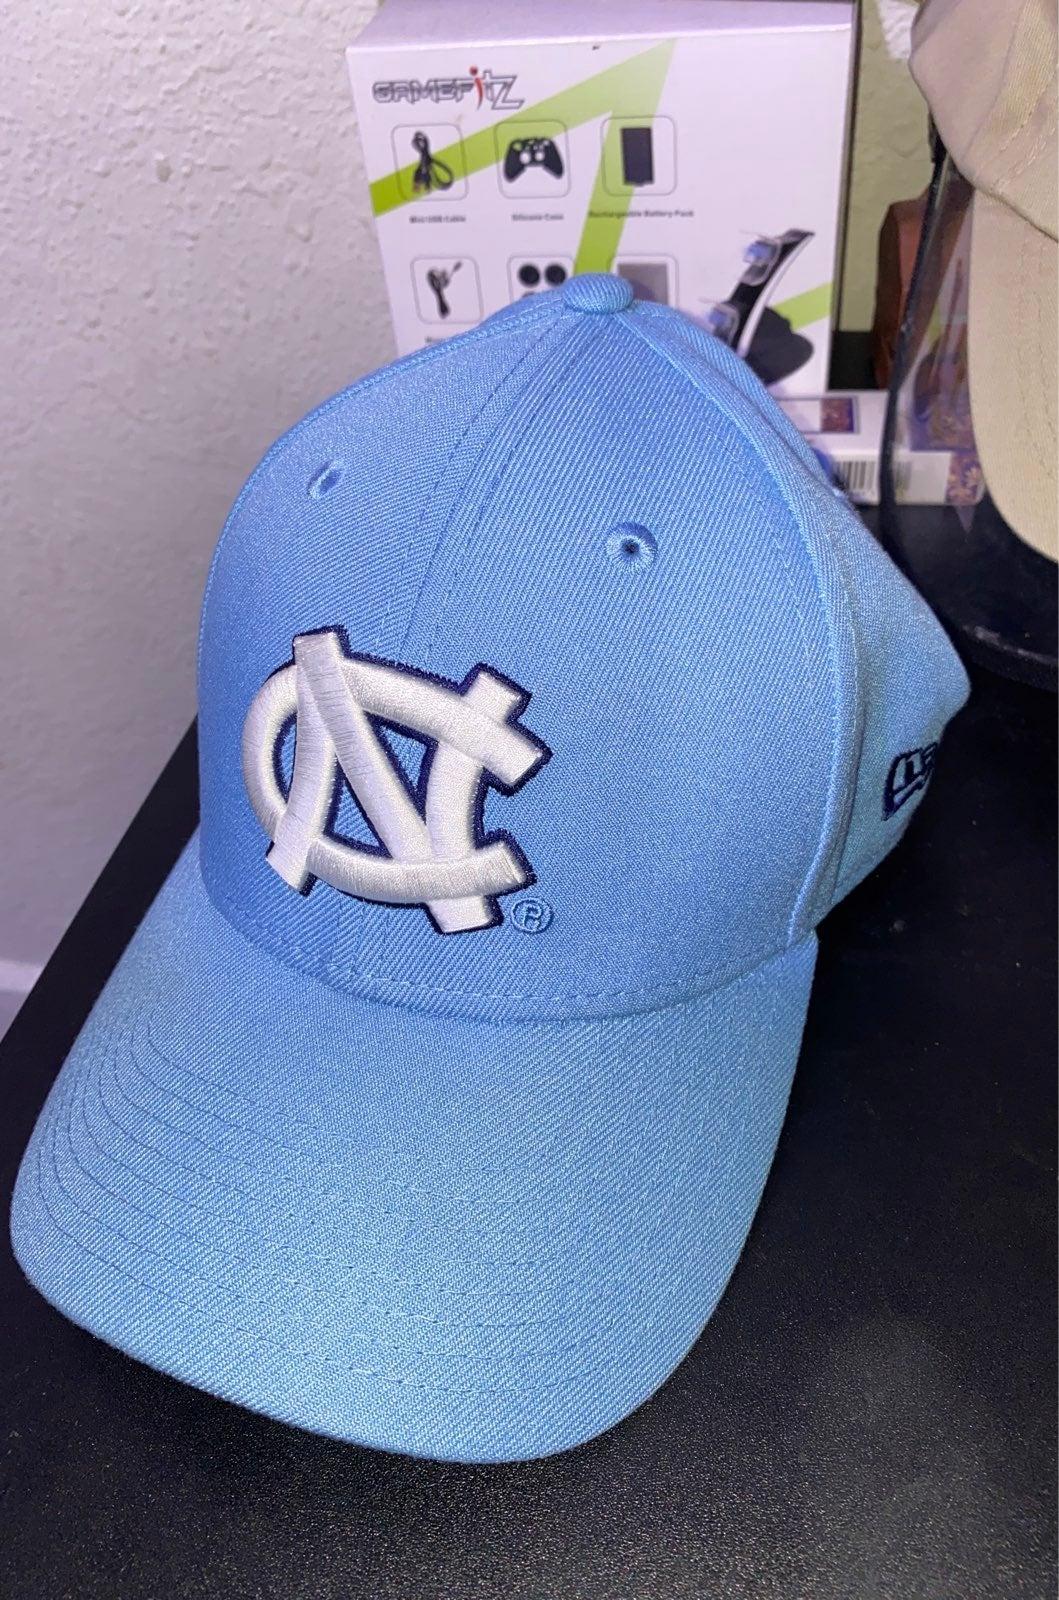 North Carolina hat